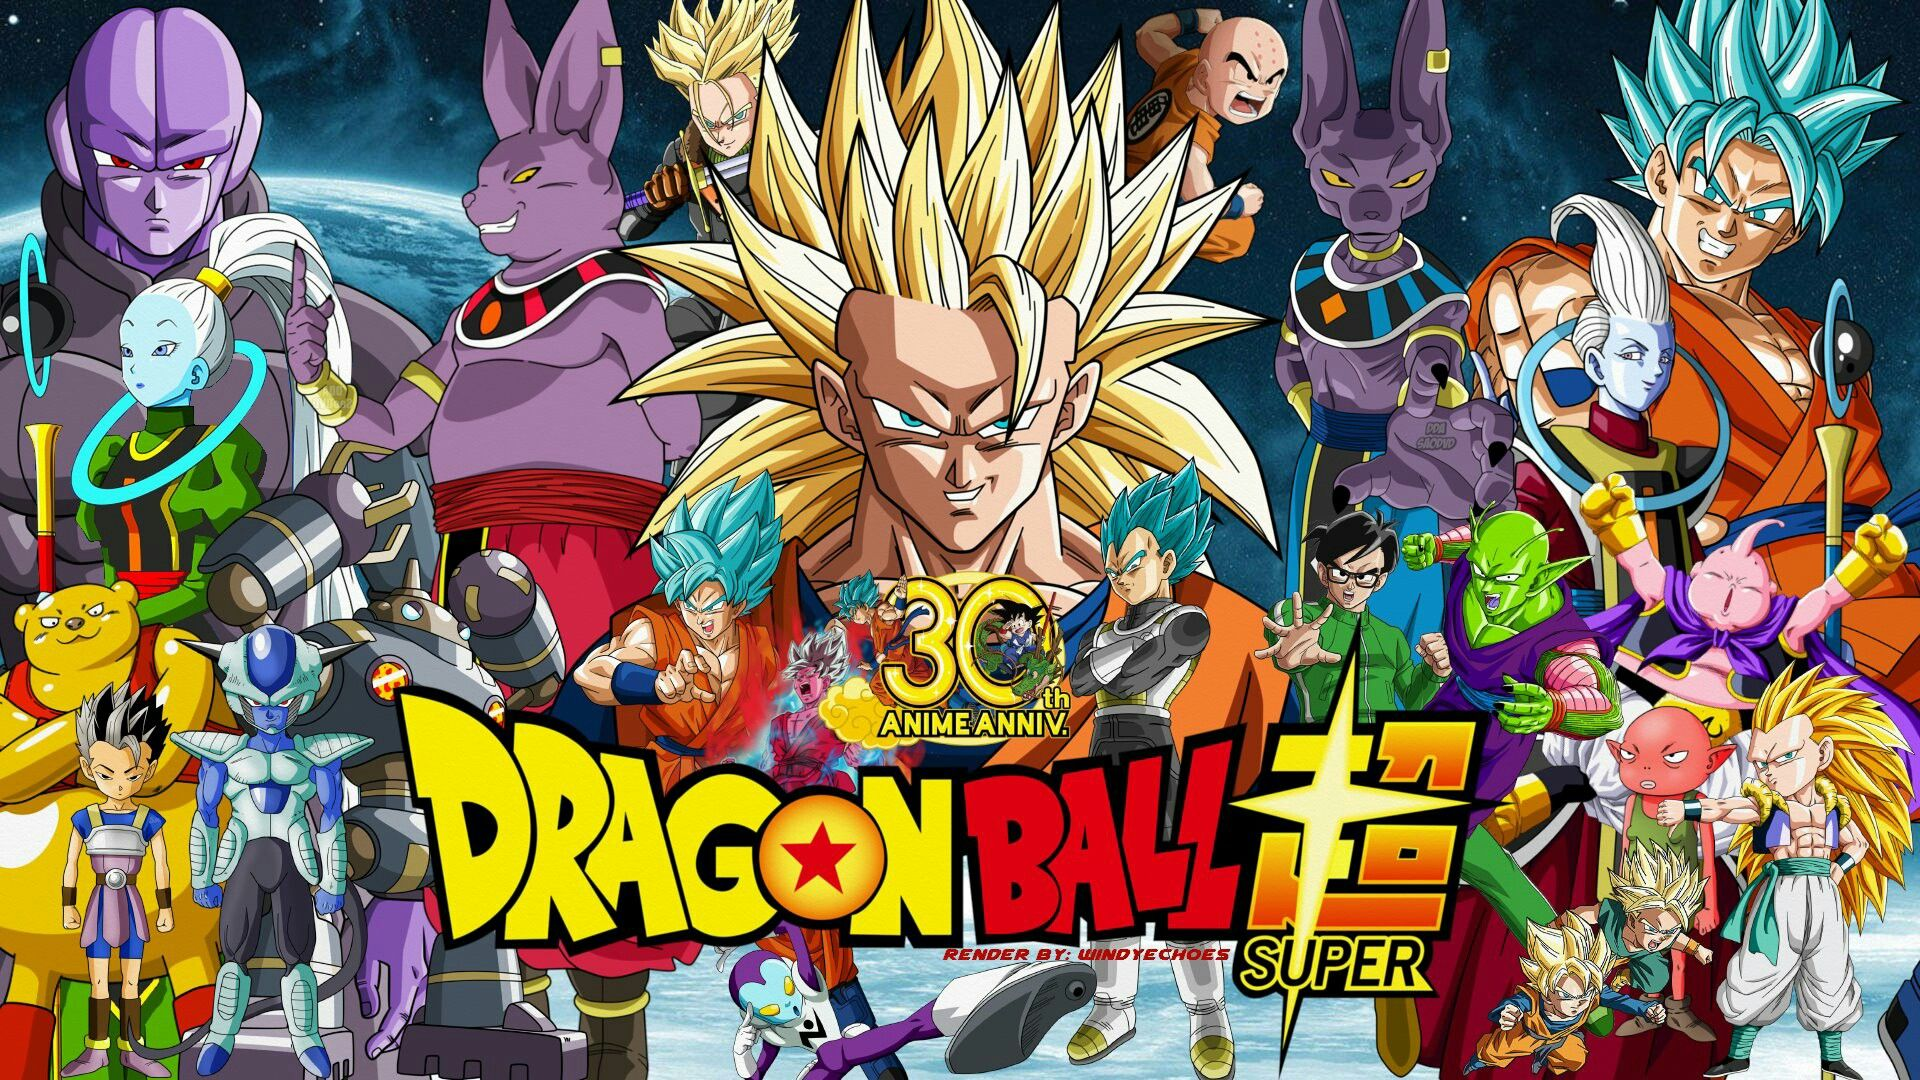 Pin By Pikachu On Dragon Ball Dragon Ball Super Wallpapers